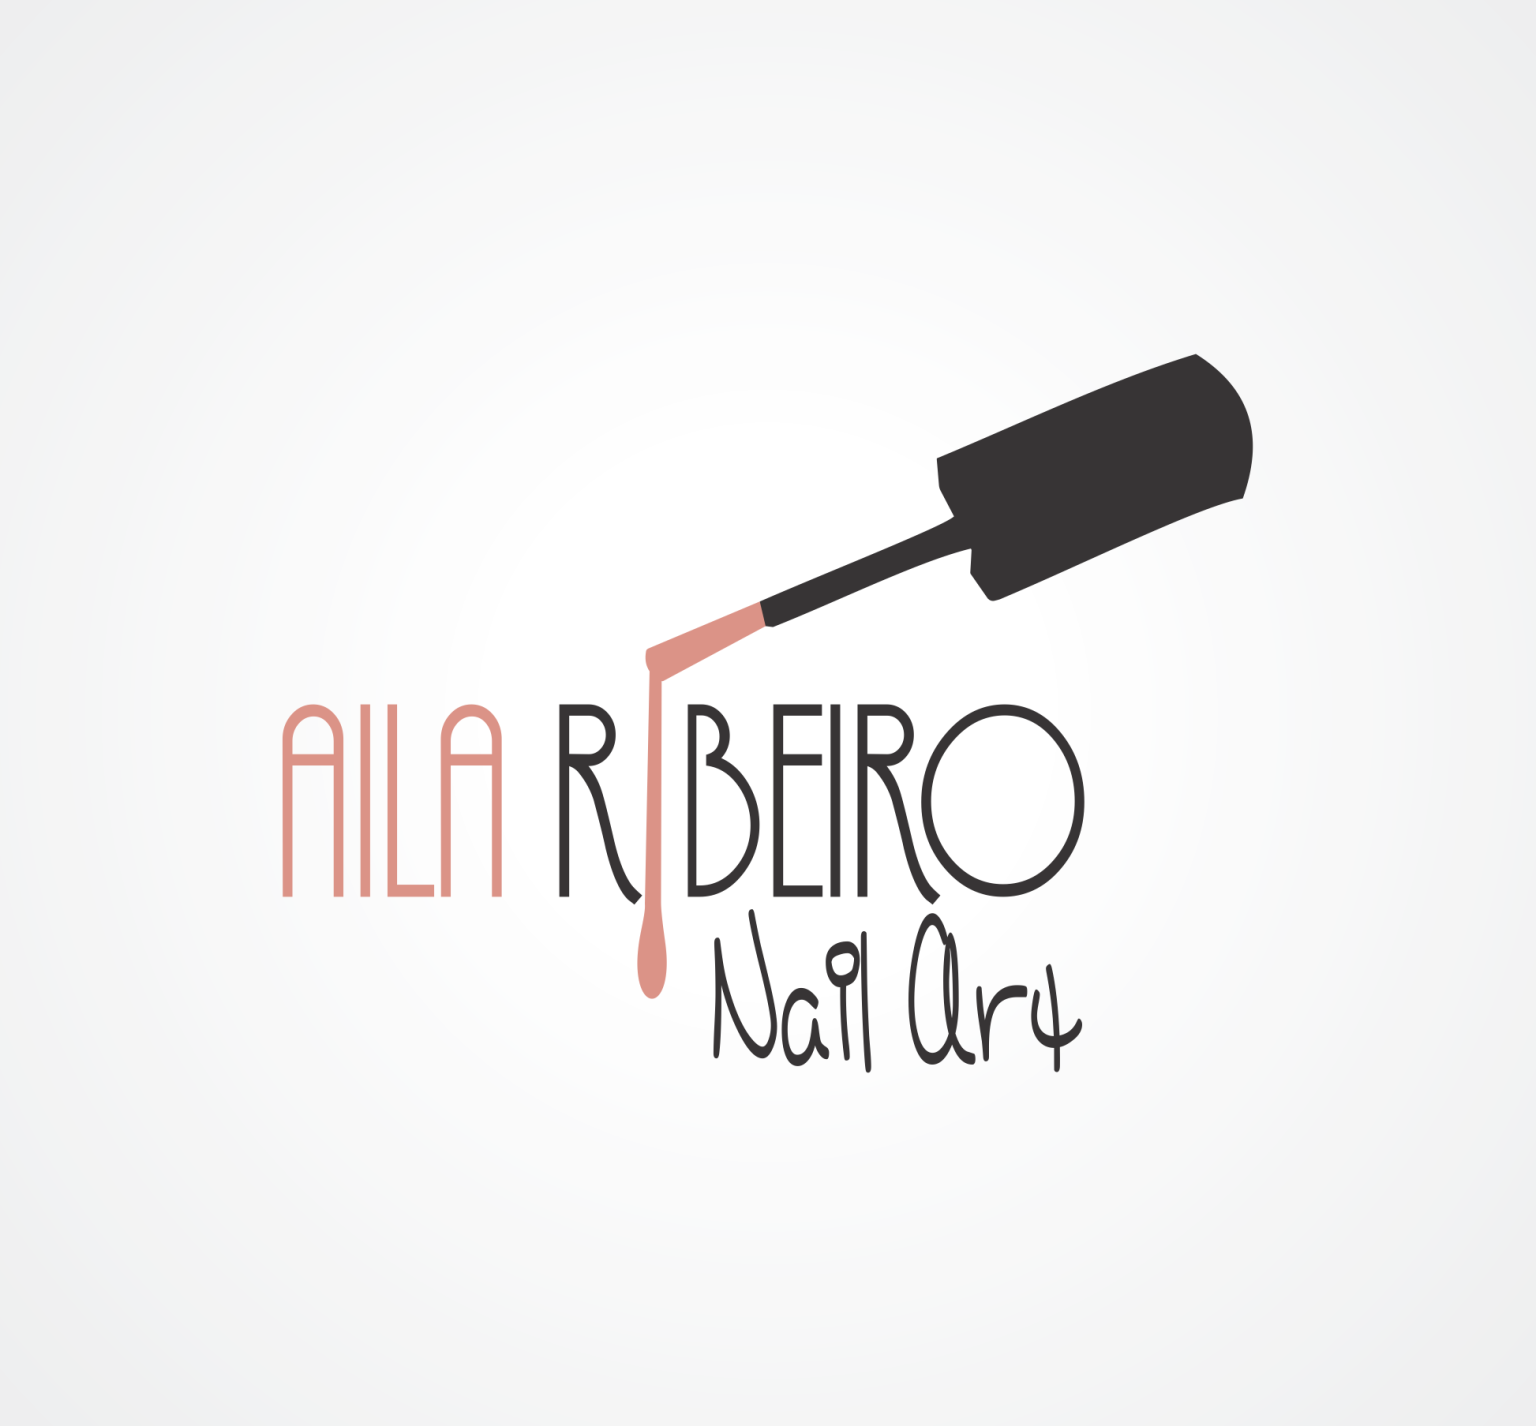 Aila ribeiro nail art makeup artist logo pinterest logos aila ribeiro nail art prinsesfo Choice Image